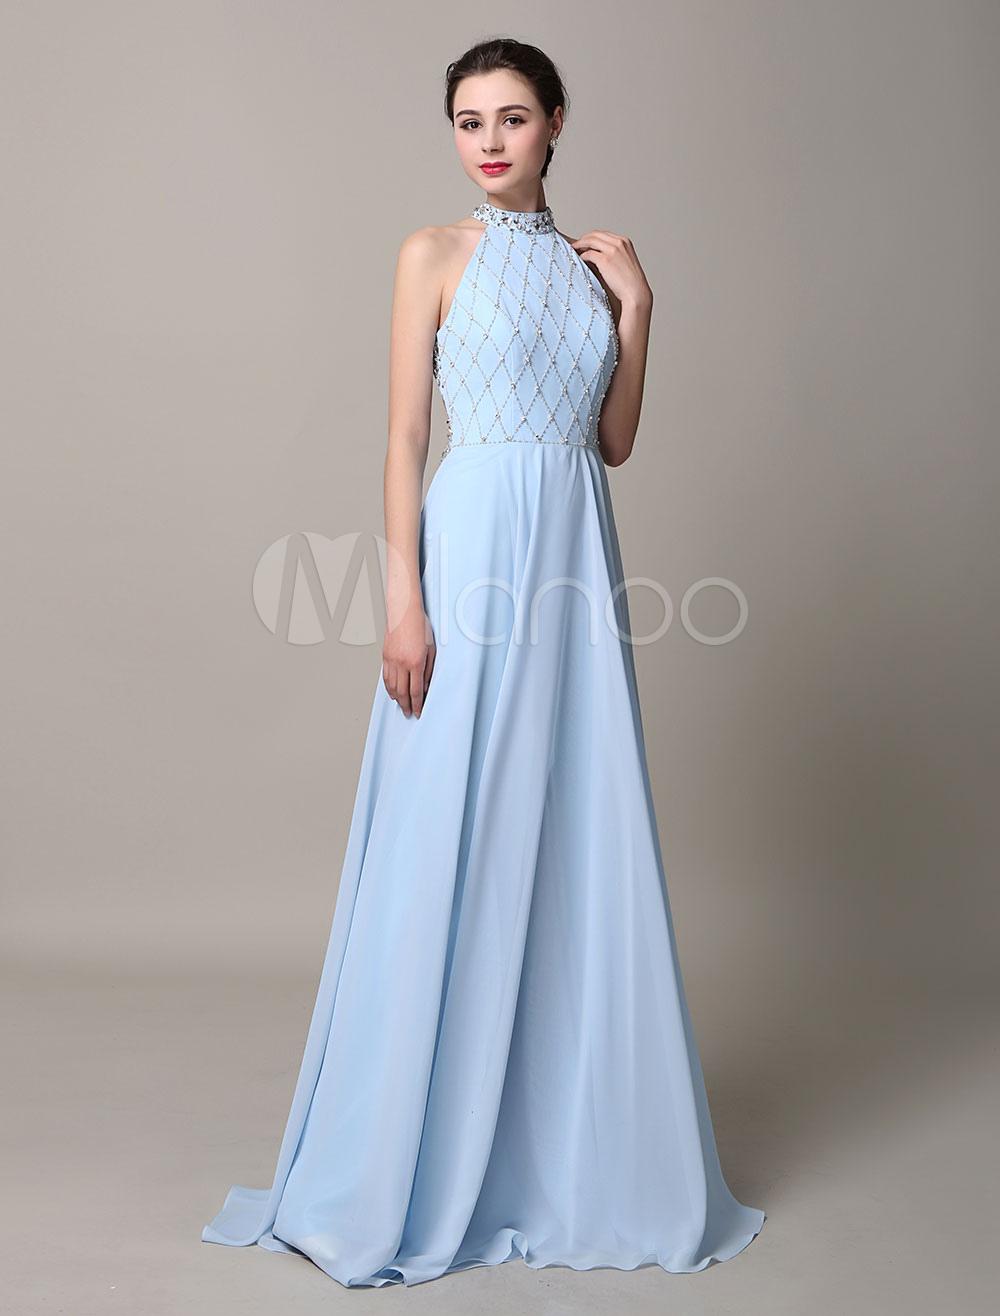 Light Sky Blue Cross Backless A-Line Beaded Evening Dress (Wedding Evening Dresses) photo